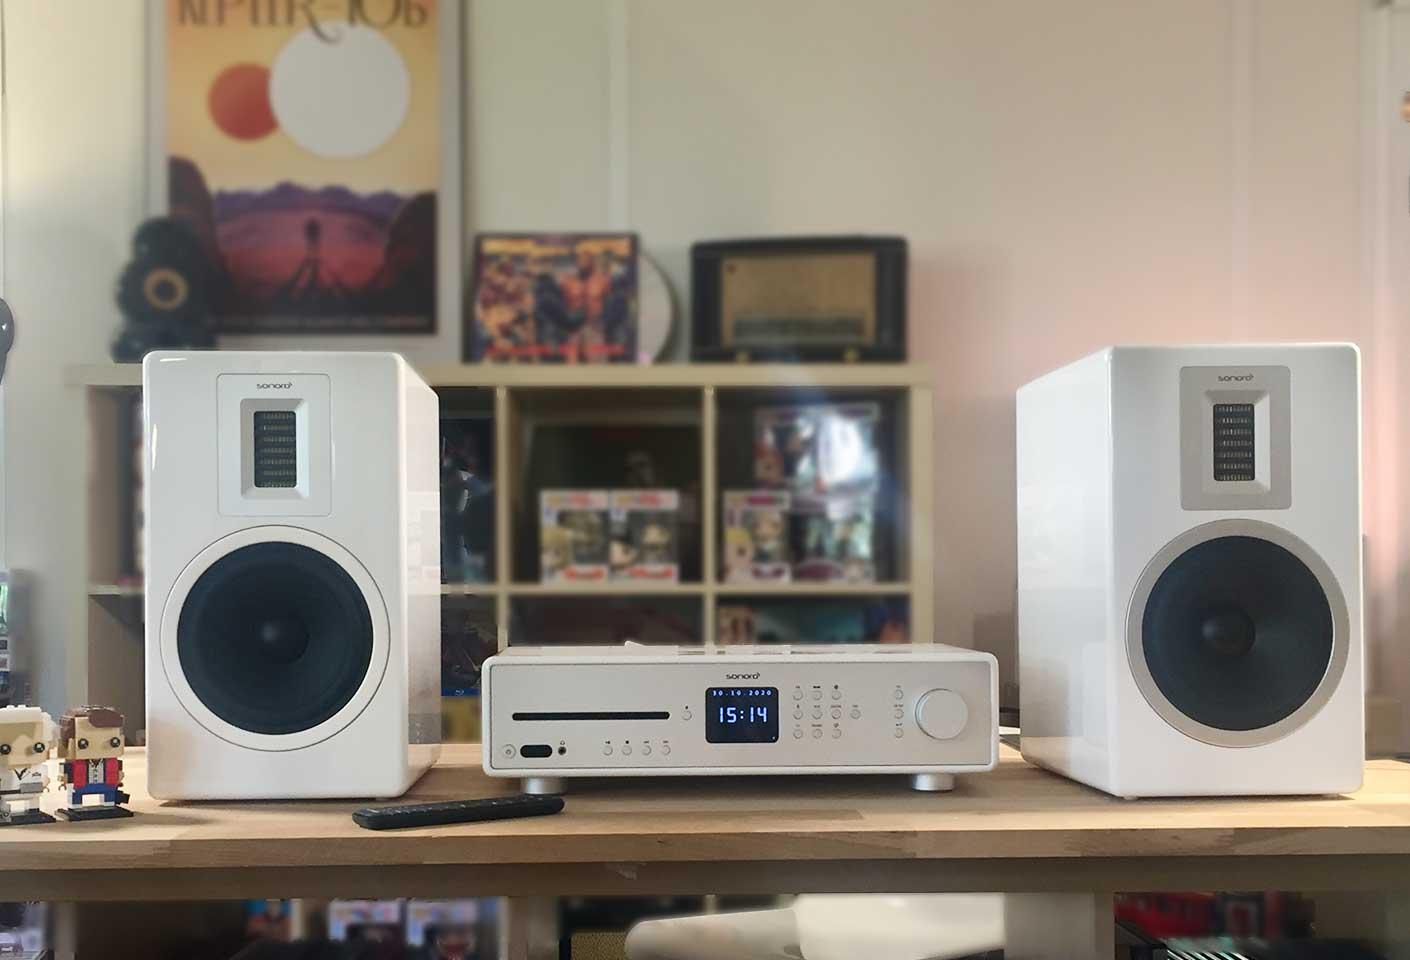 Chaine Hifi connectée WiFi, 2 X 170 Watts composée de l'ampli Sonoro Maestro et des enceintes Sonoro Orchestra Blanc.